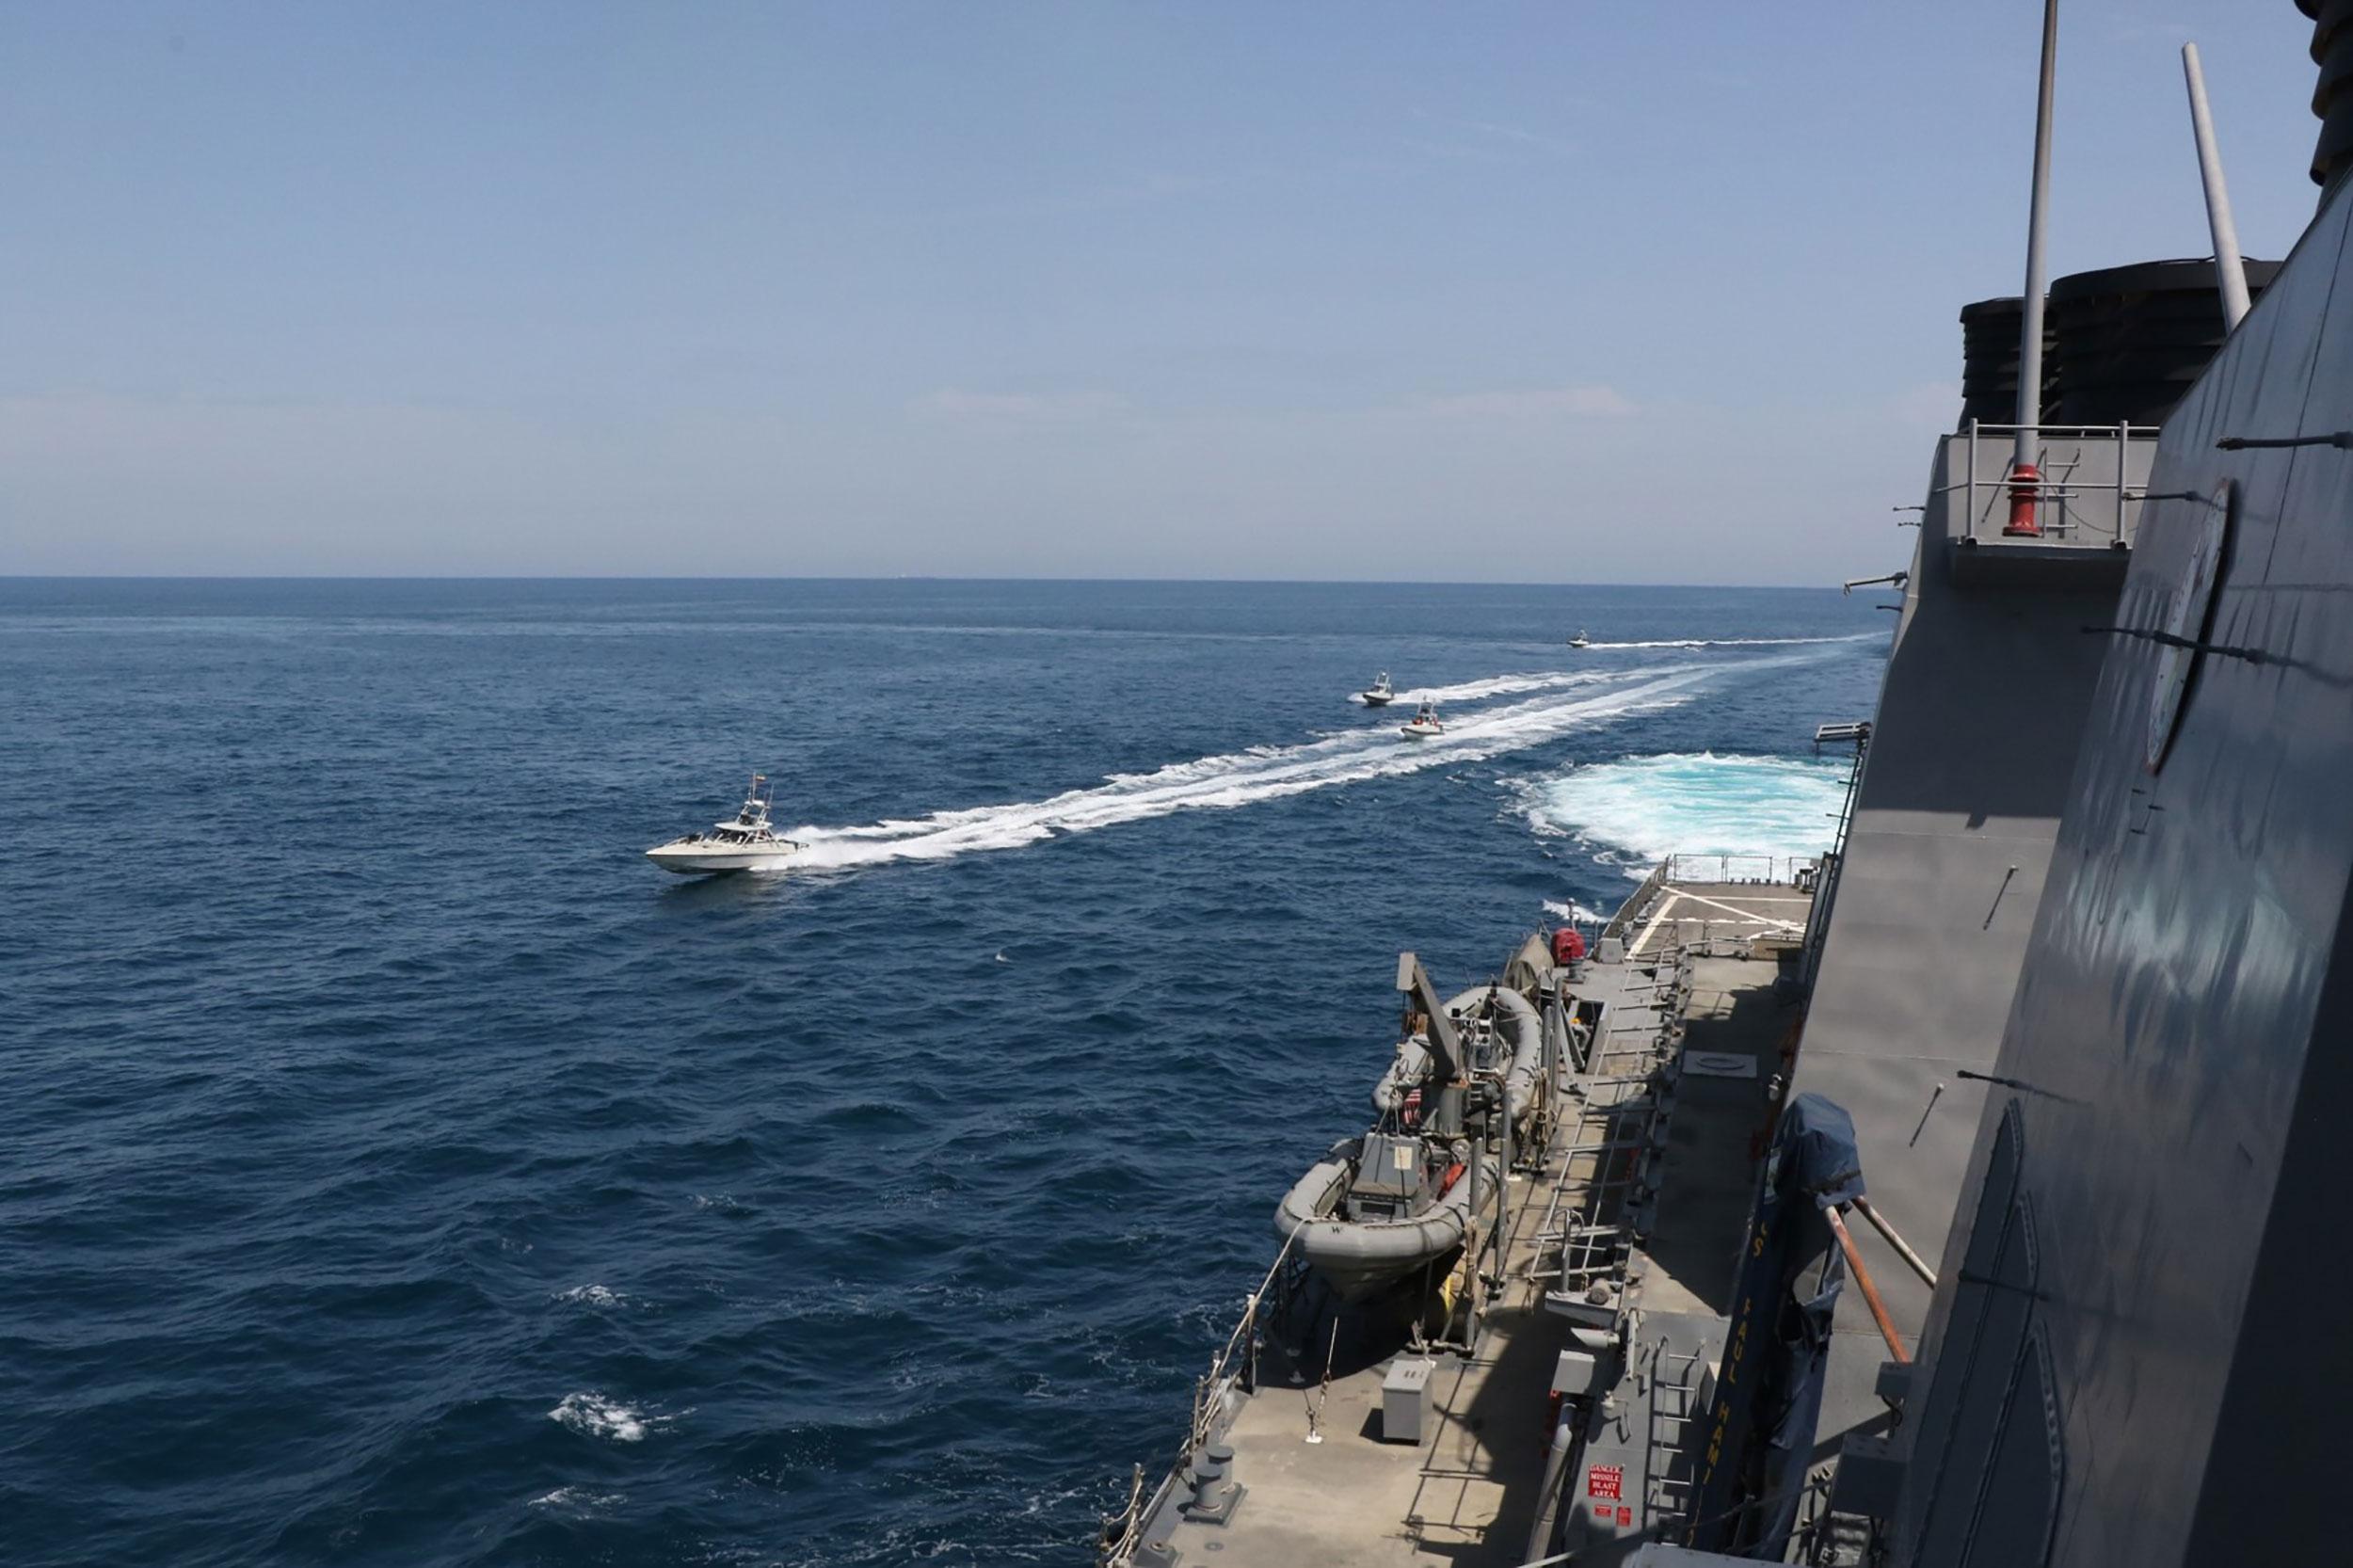 US Coast Guard ship fired around 30 warning shots at Iranian fast boats in latest tense encounter